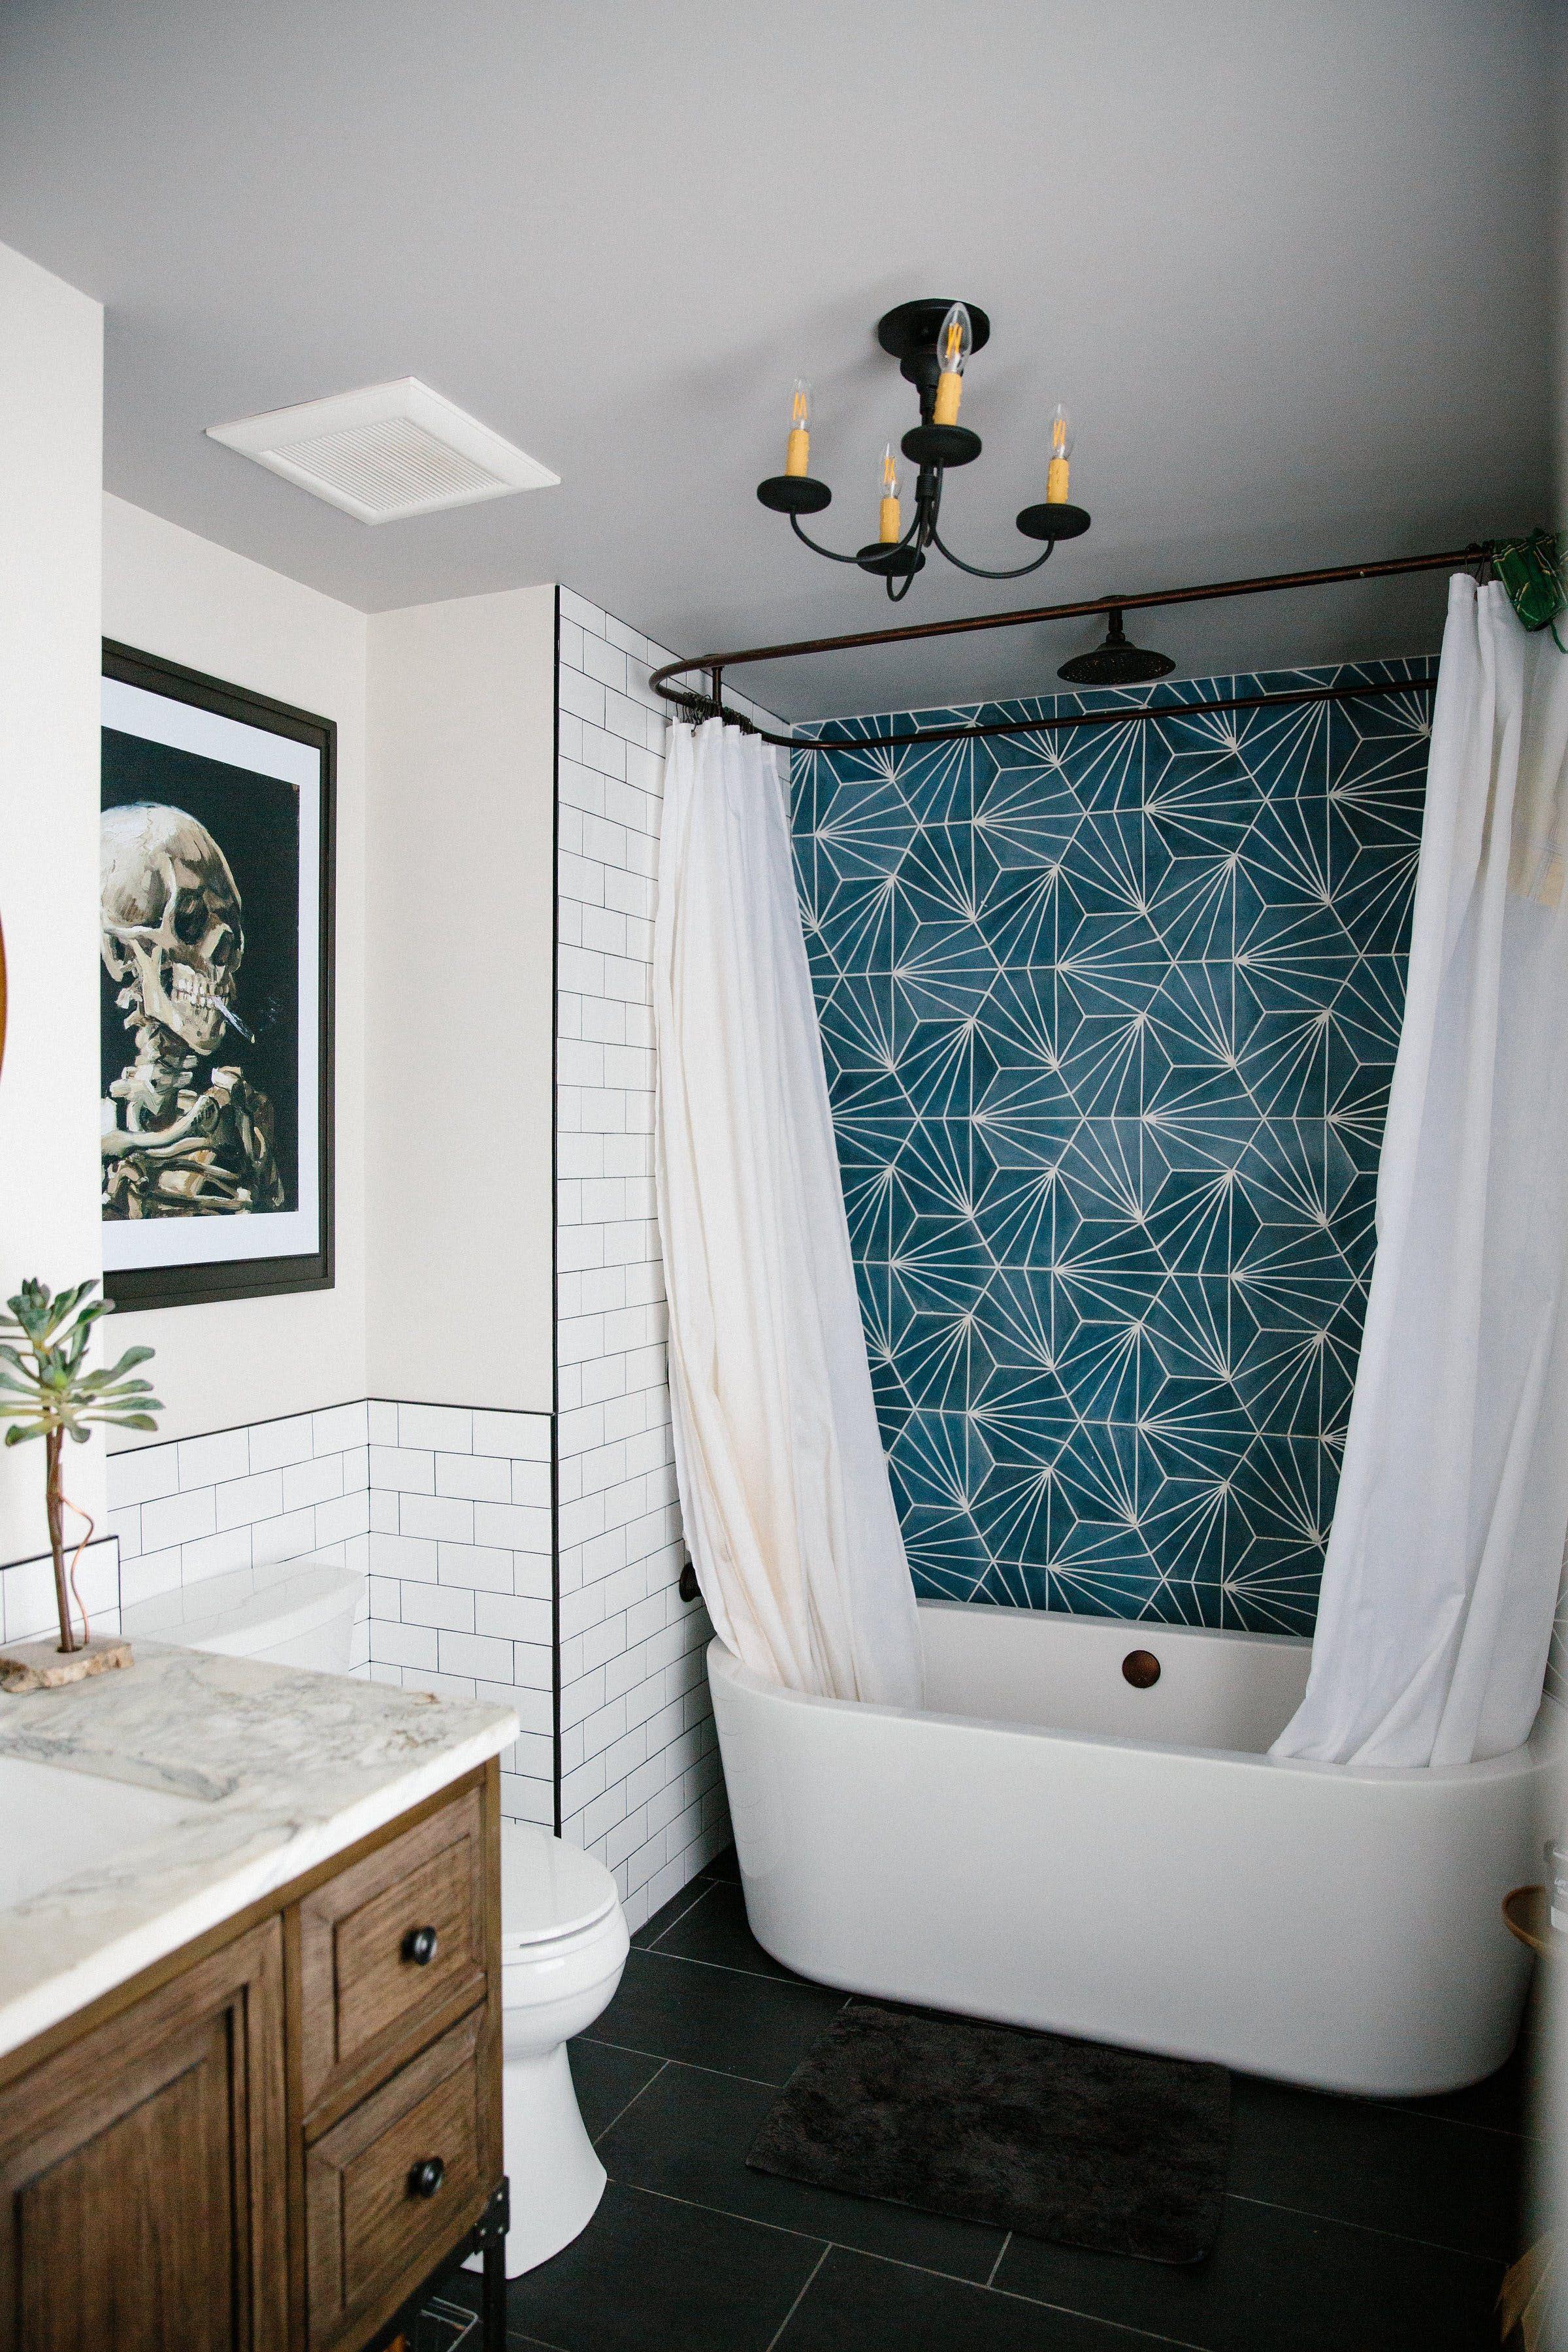 This Creepy Cool Salem Home Is Giving Us So Much Halloween Inspo Bathroom Interior Best Bathroom Tiles Decor Interior Design